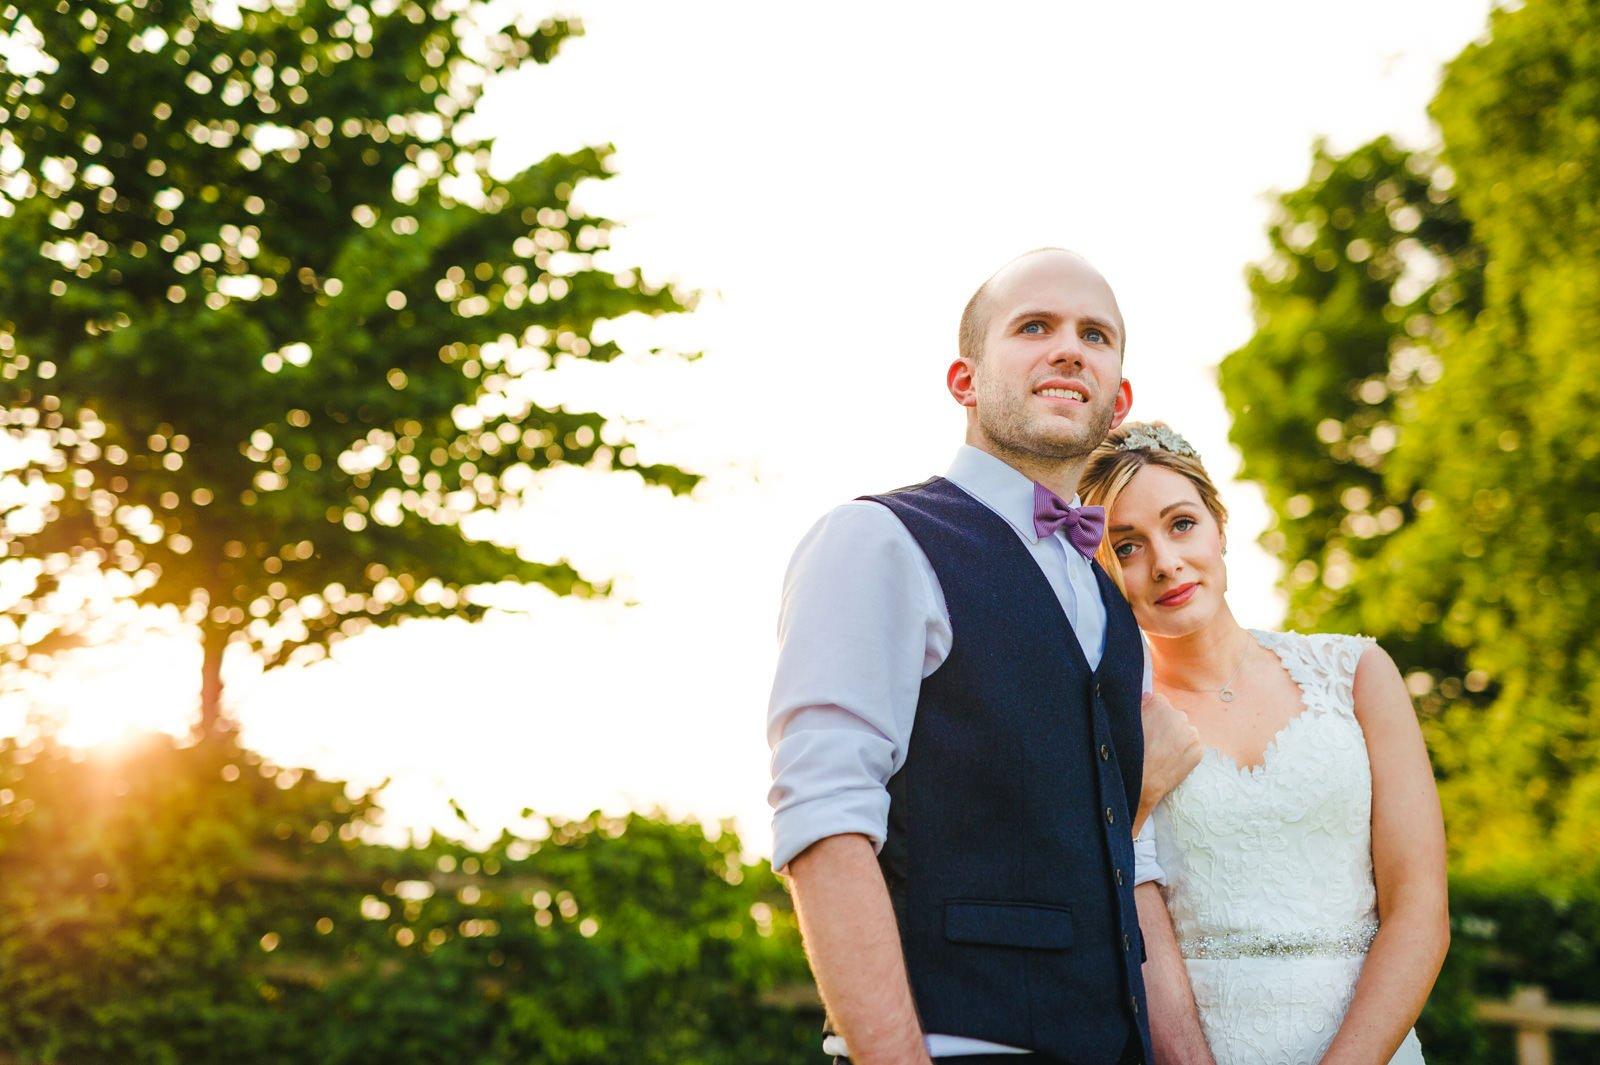 Millers Of Netley wedding, Dorrington, Shrewsbury | Emma + Ben 87